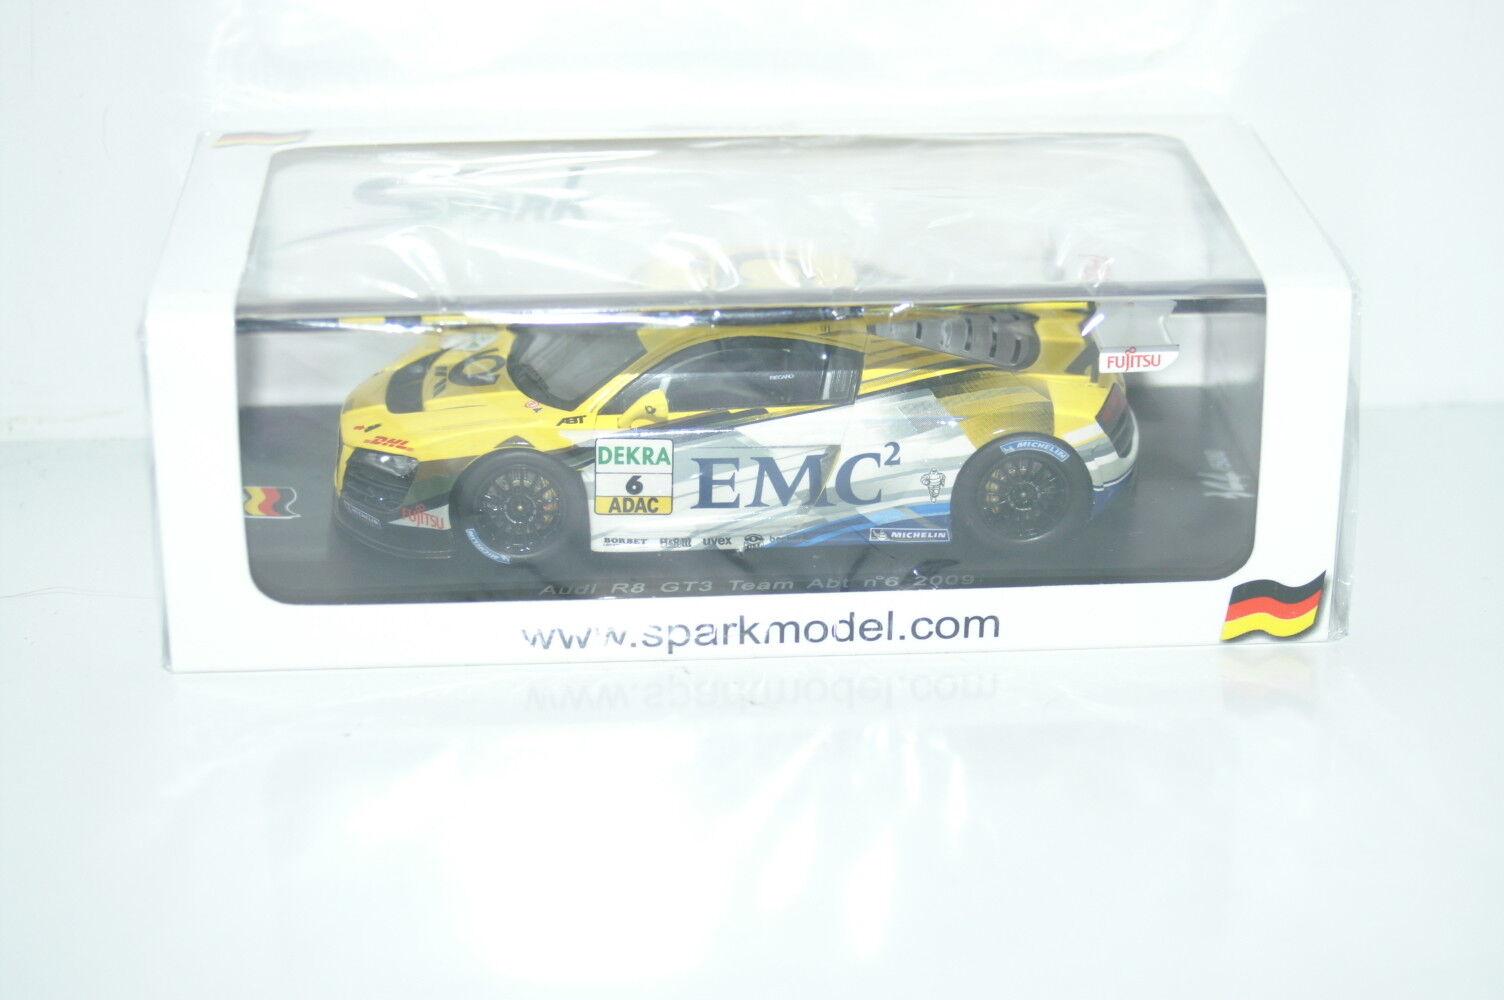 Audi R8 GT3 Team Abt n°6 2009